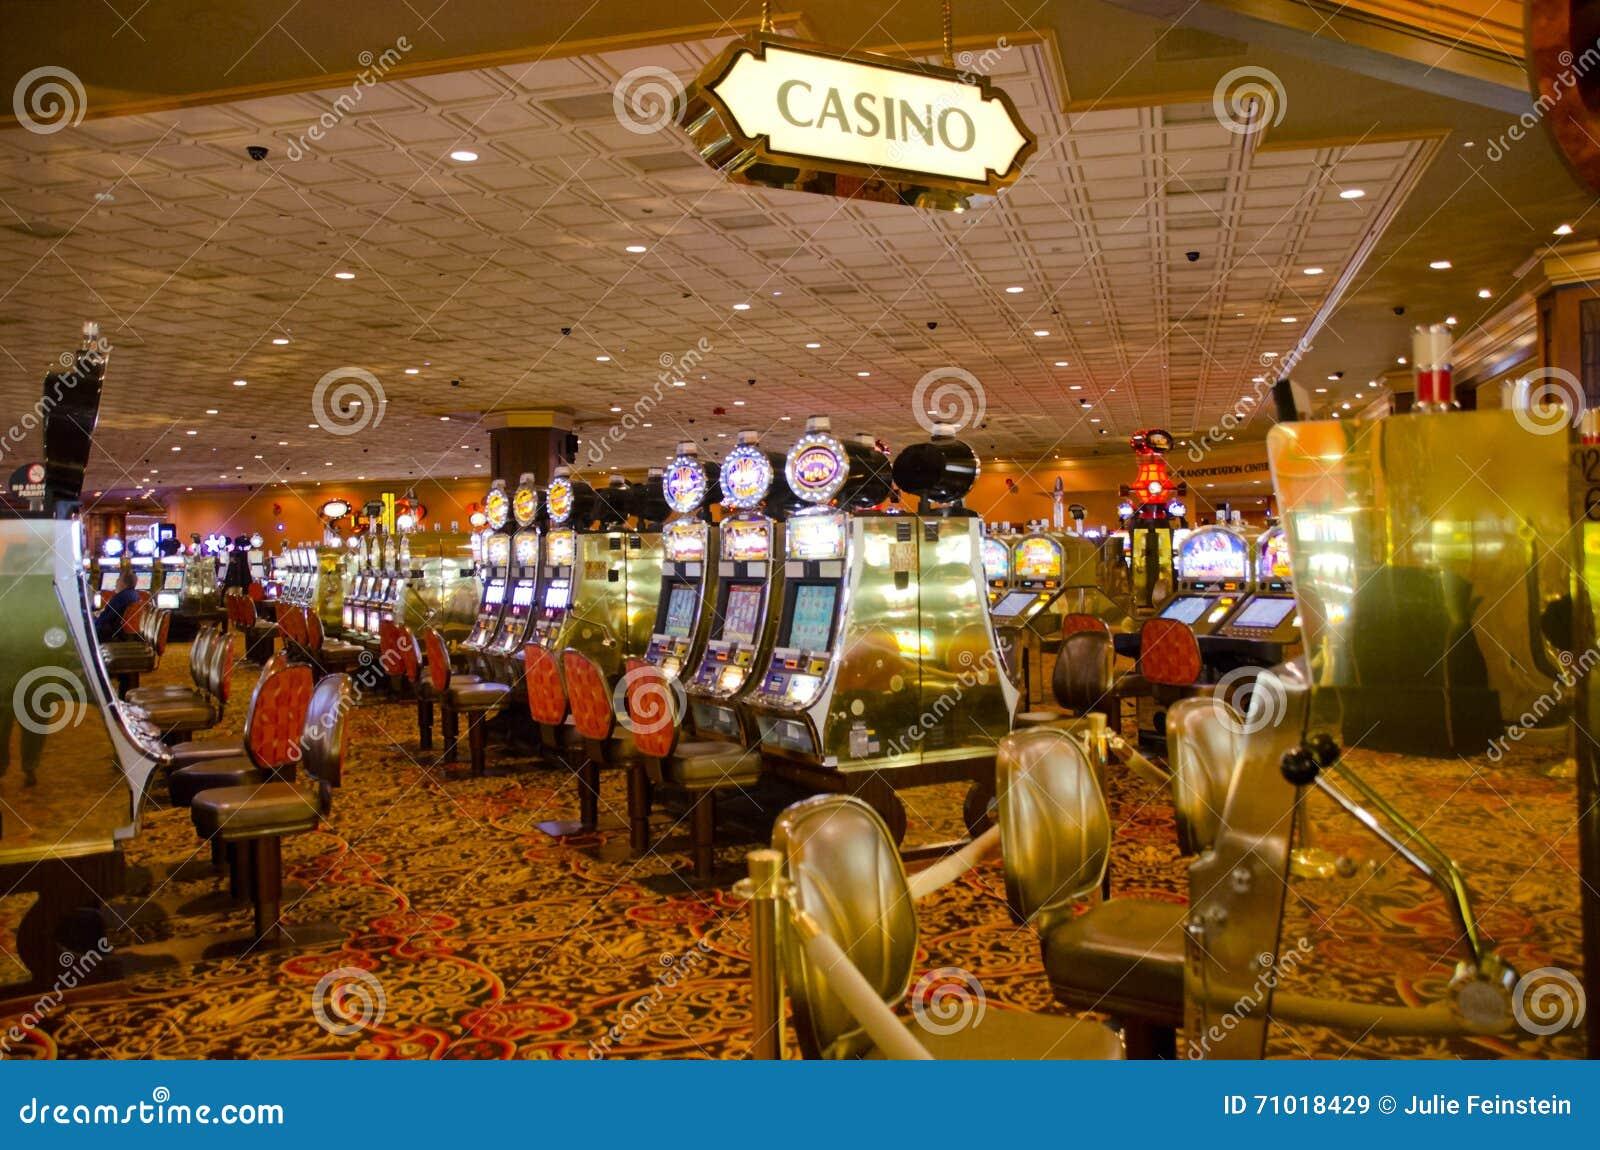 Trump casino in atlantic city editorial stock image for Taj mahal online casino